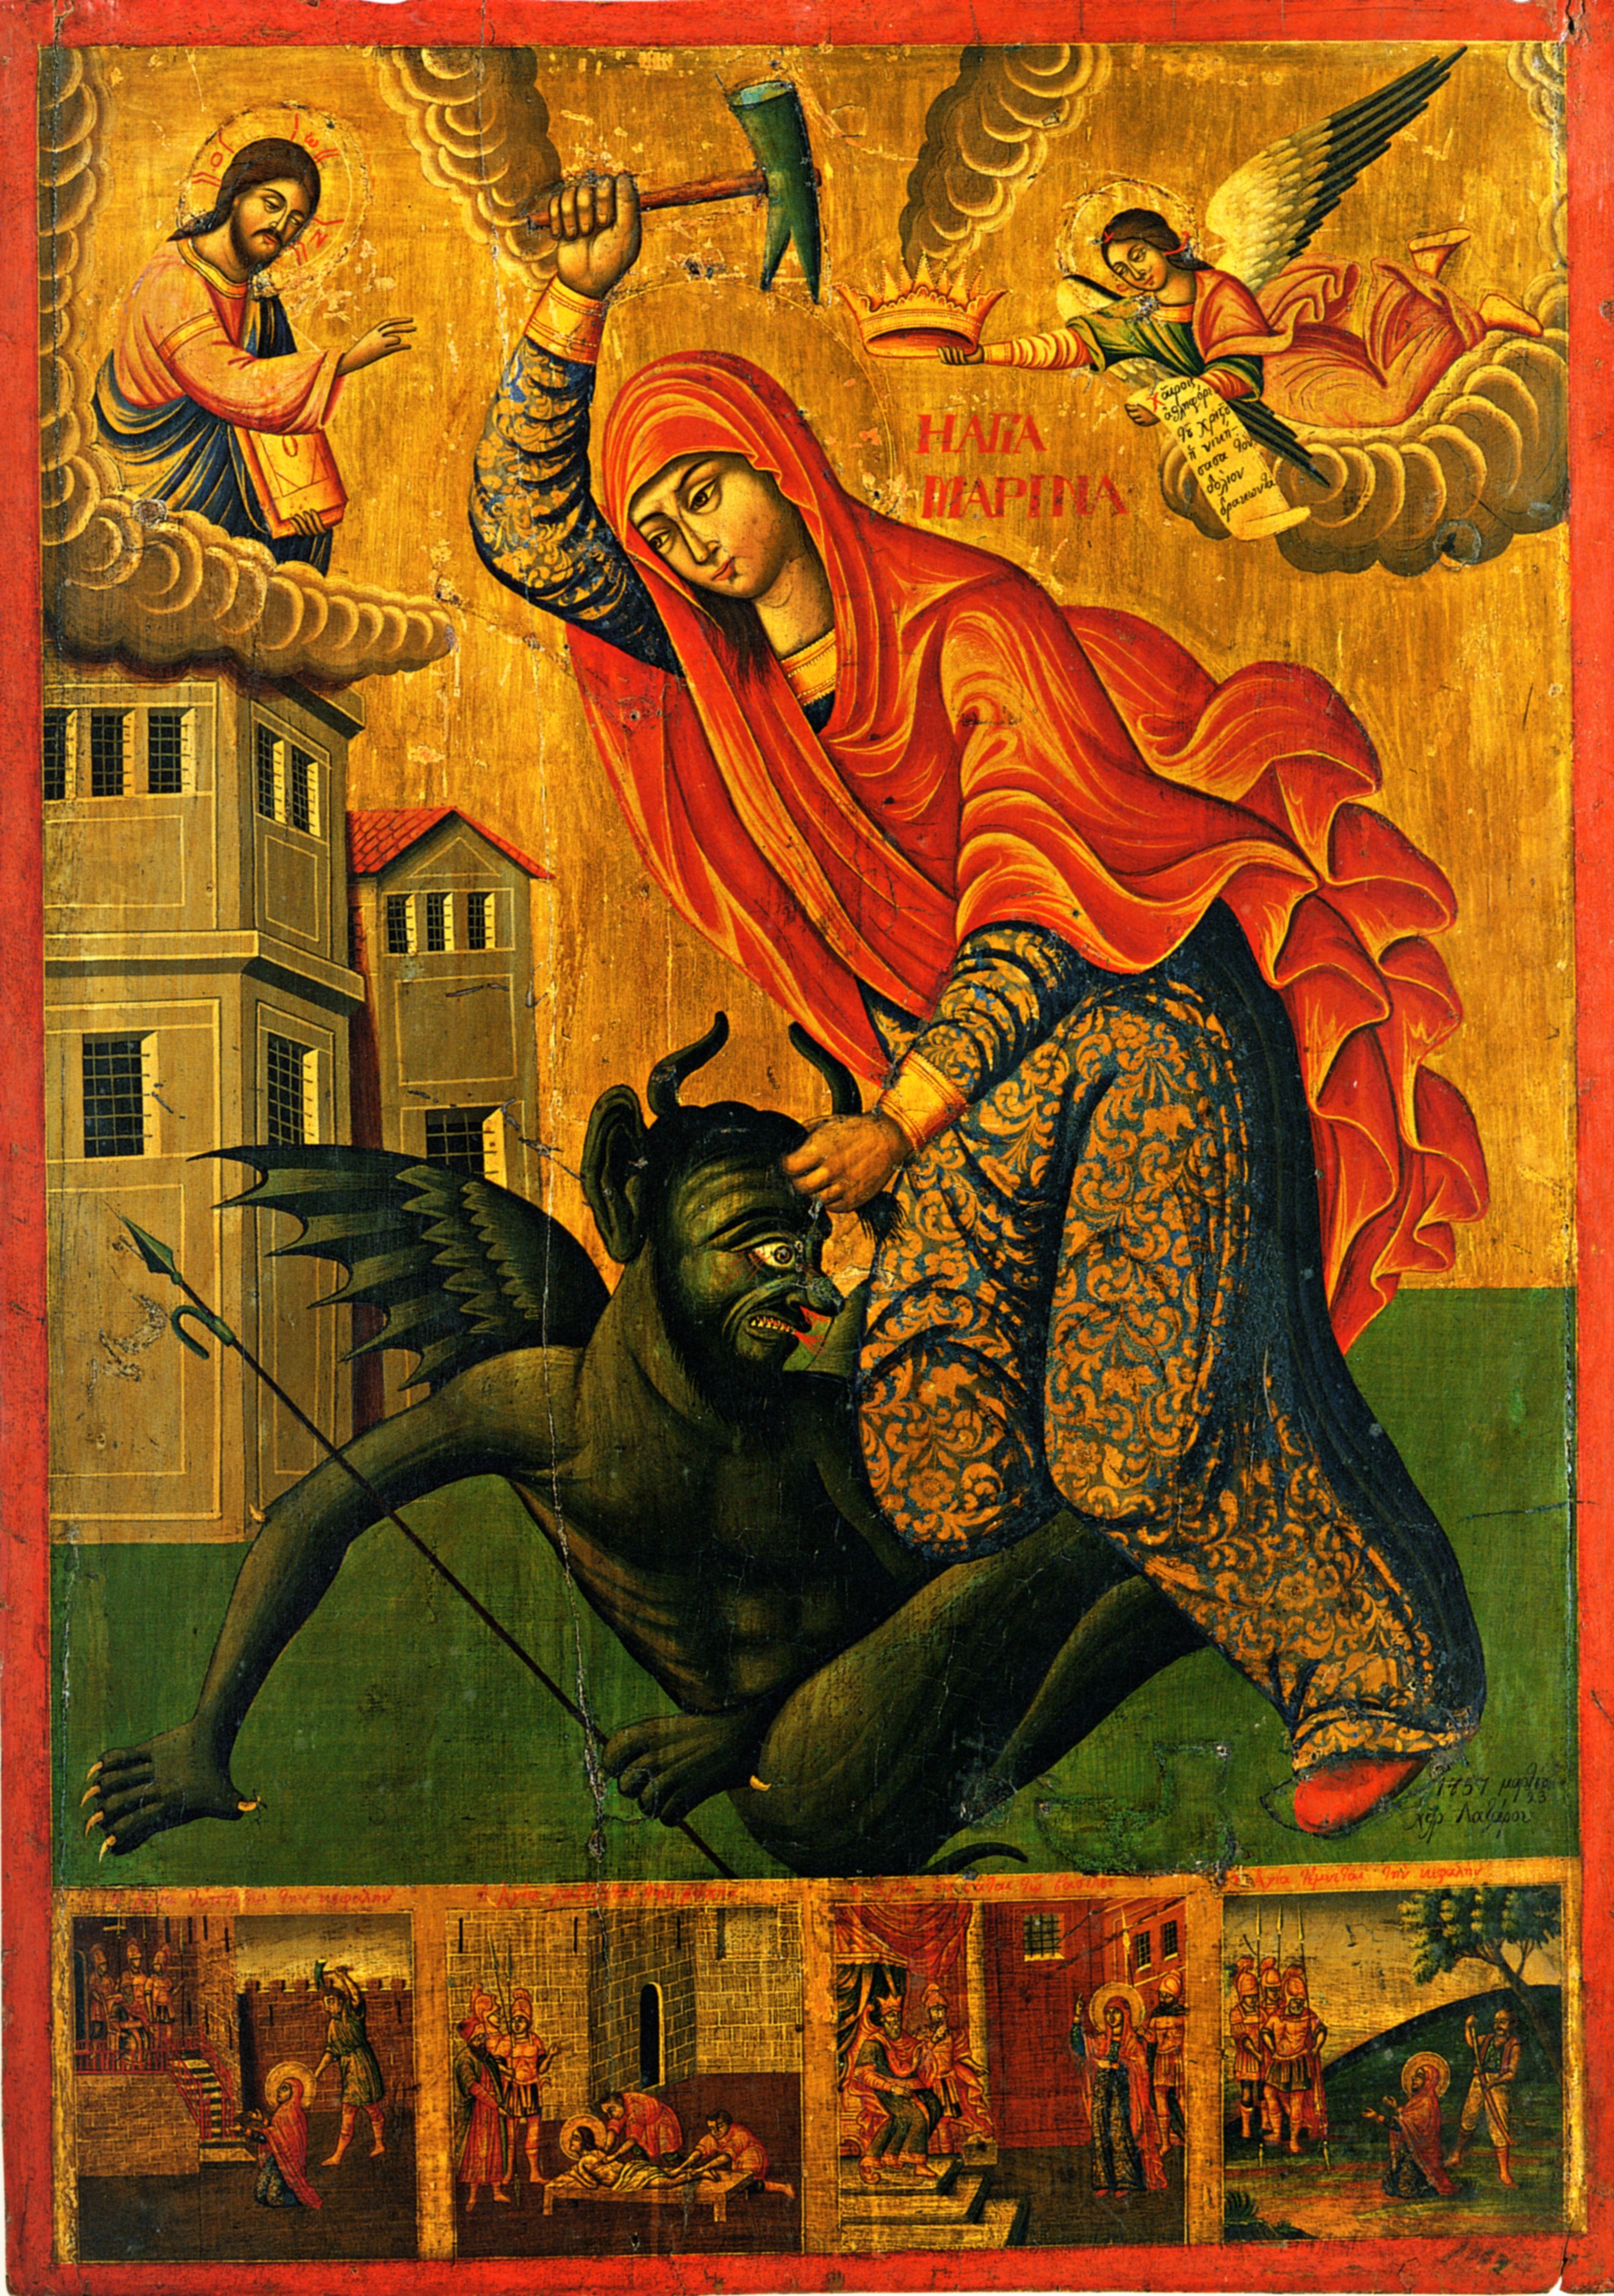 ST MARINA,DEVIL